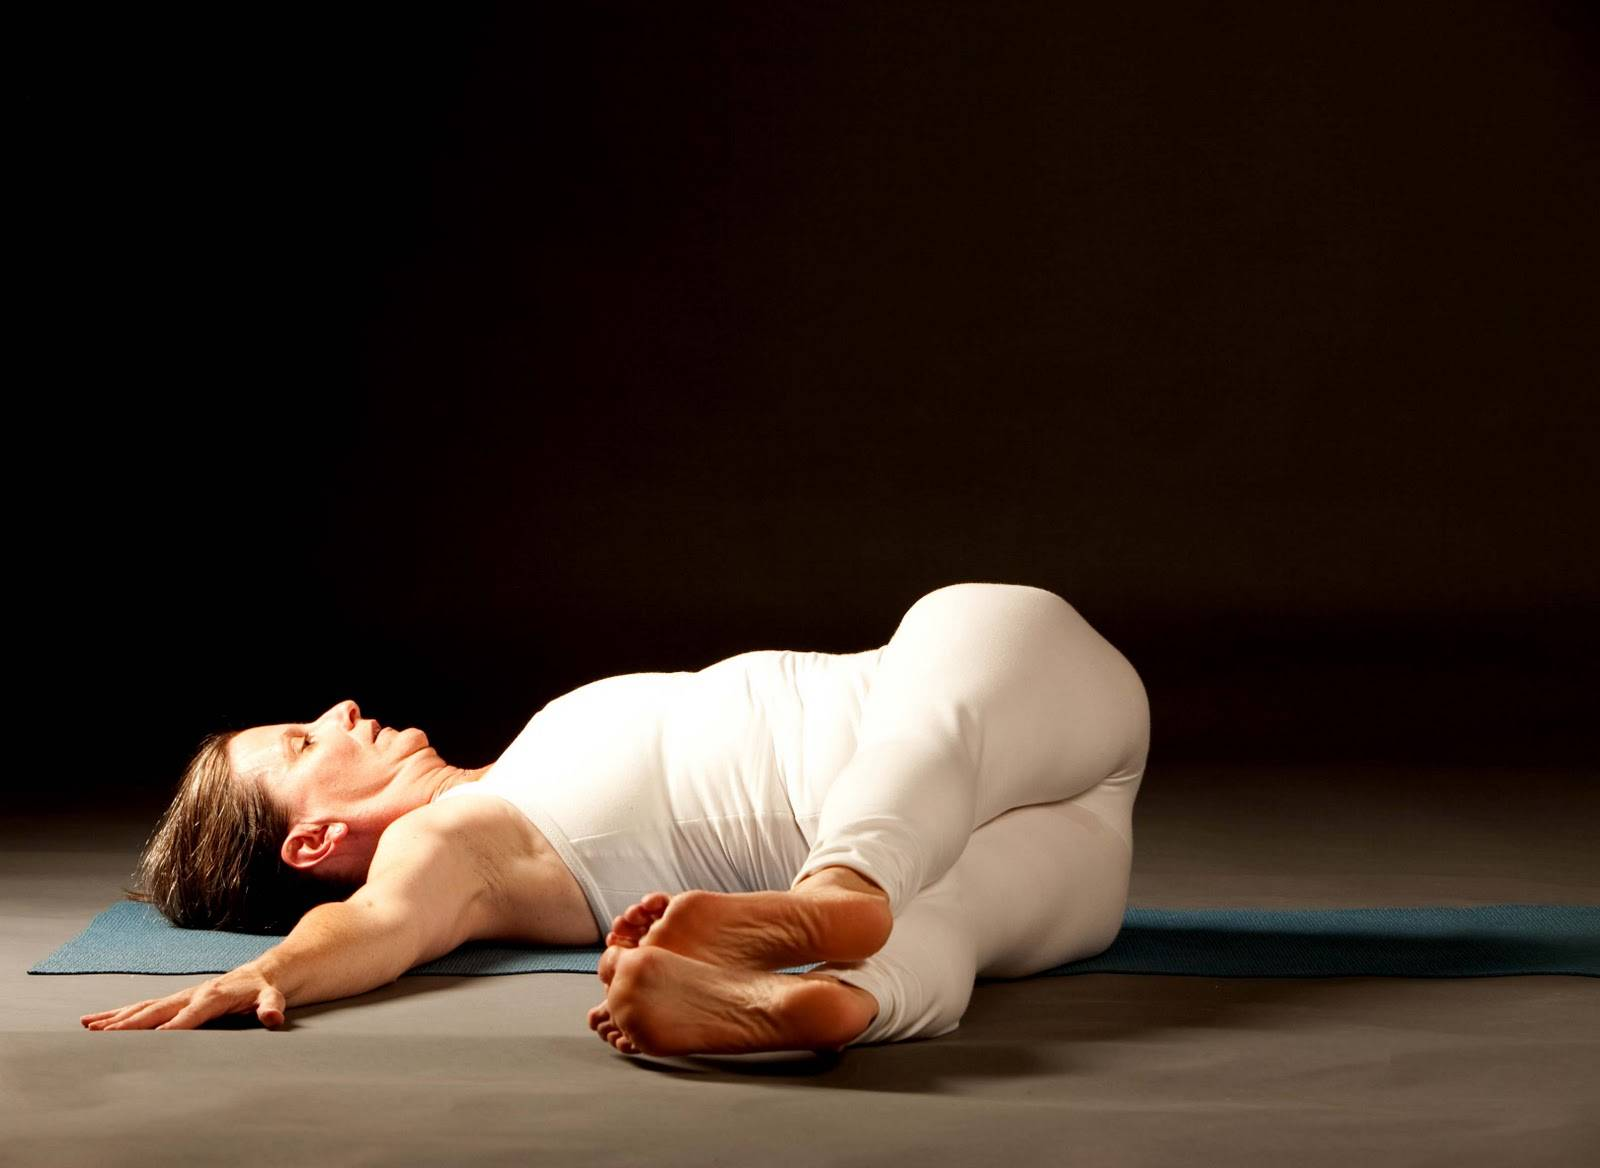 Васиштхасана или поза мудреца васиштхи в йоге: техника выполнения с фото и польза